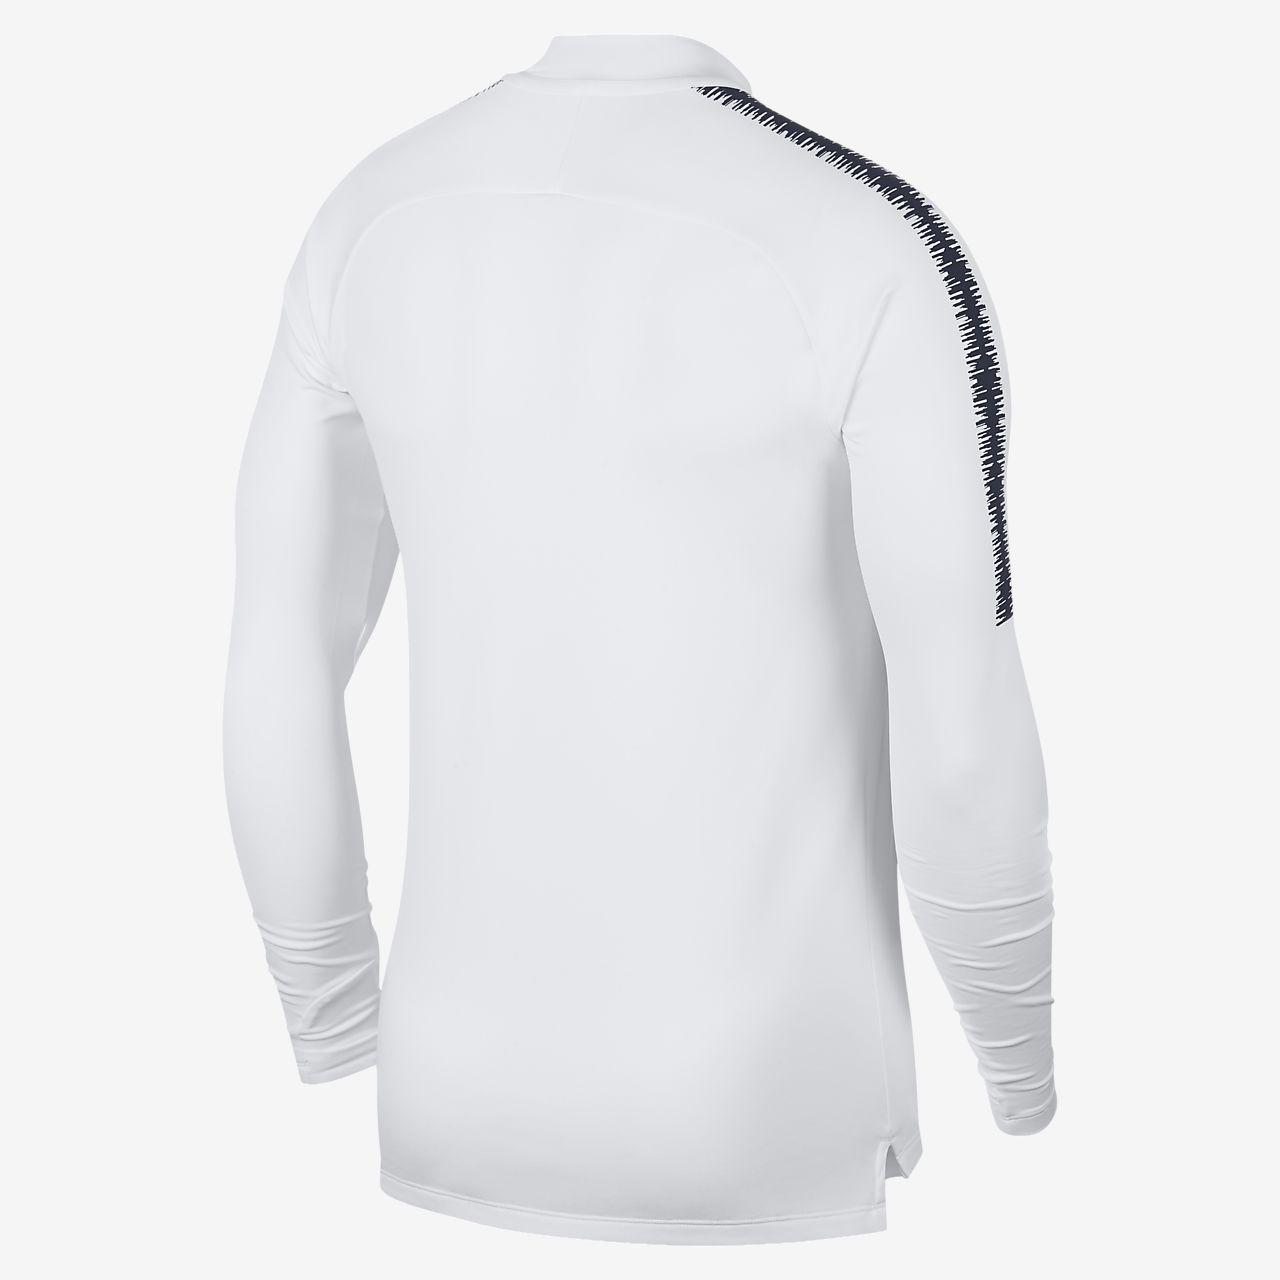 dce171750 FFF Dri-FIT Squad Drill Men s Long-Sleeve Football Top. Nike.com DK